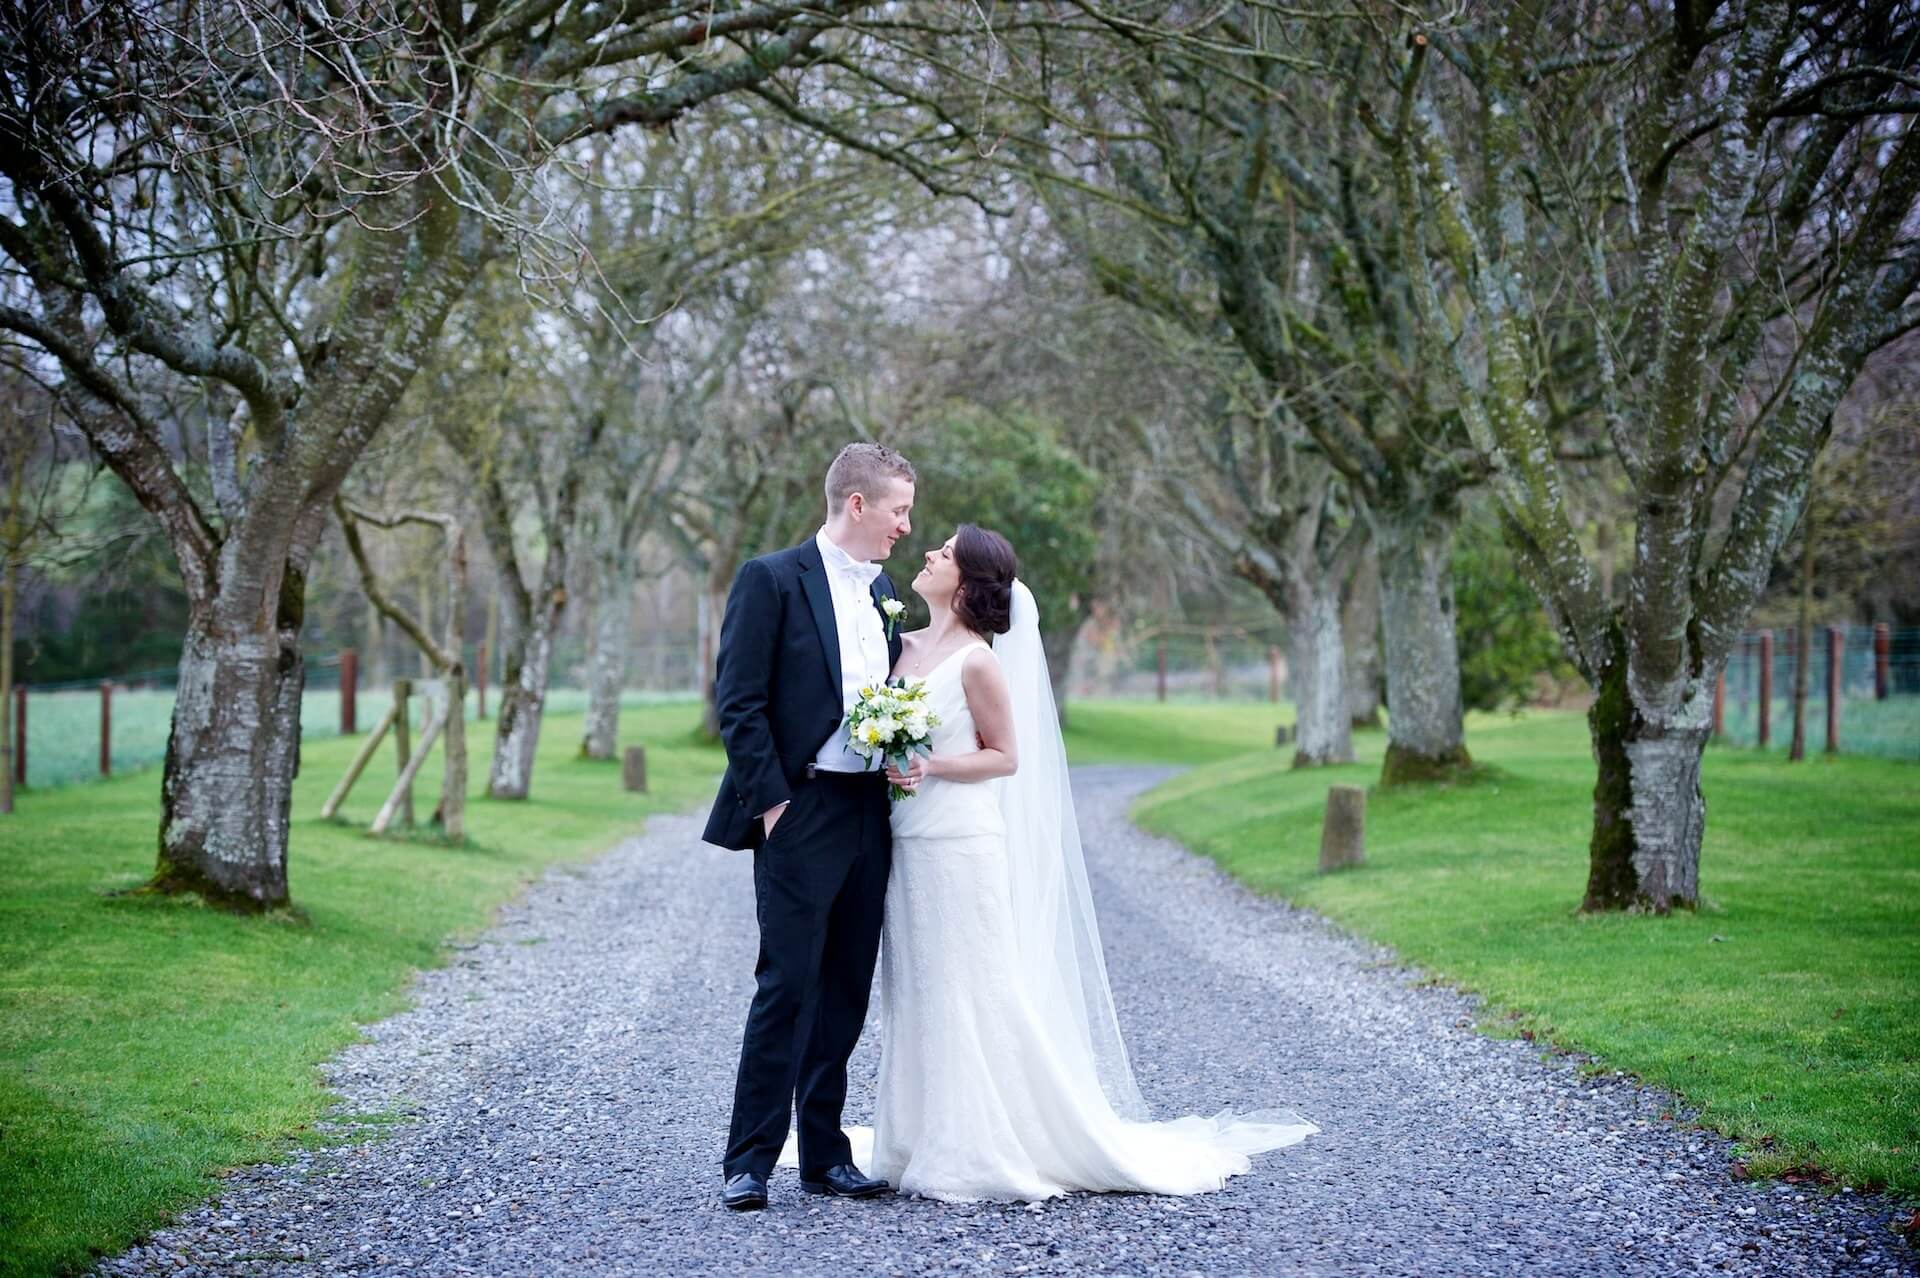 024 Wedding Meath Ballymagarvey Village Bride and Groom on Drive